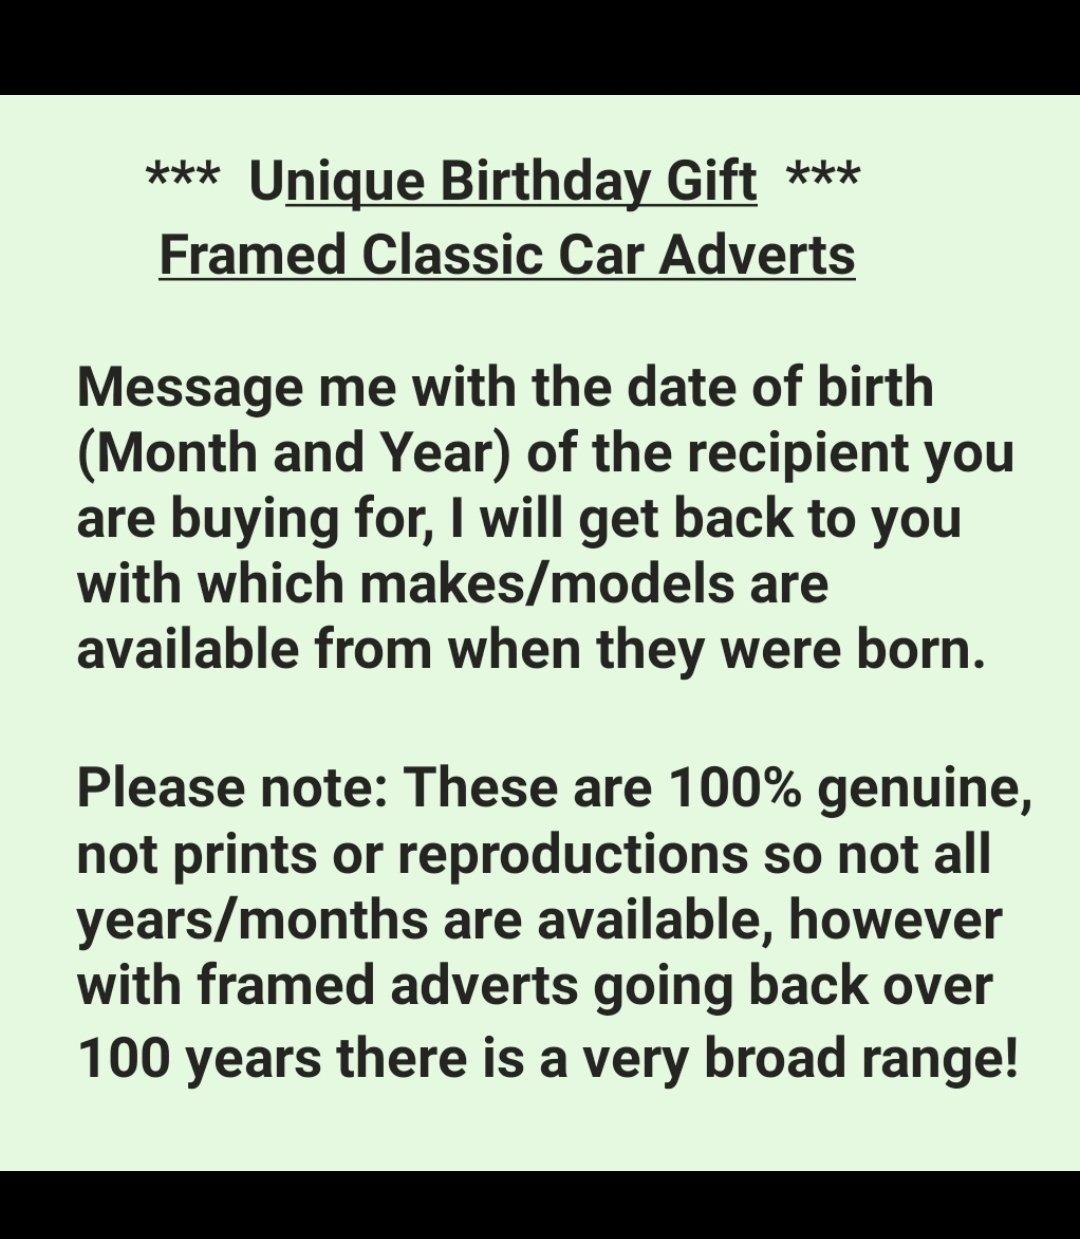 1989 Original 1922 Rolls-Royce Framed Advert  For Sale (picture 3 of 3)